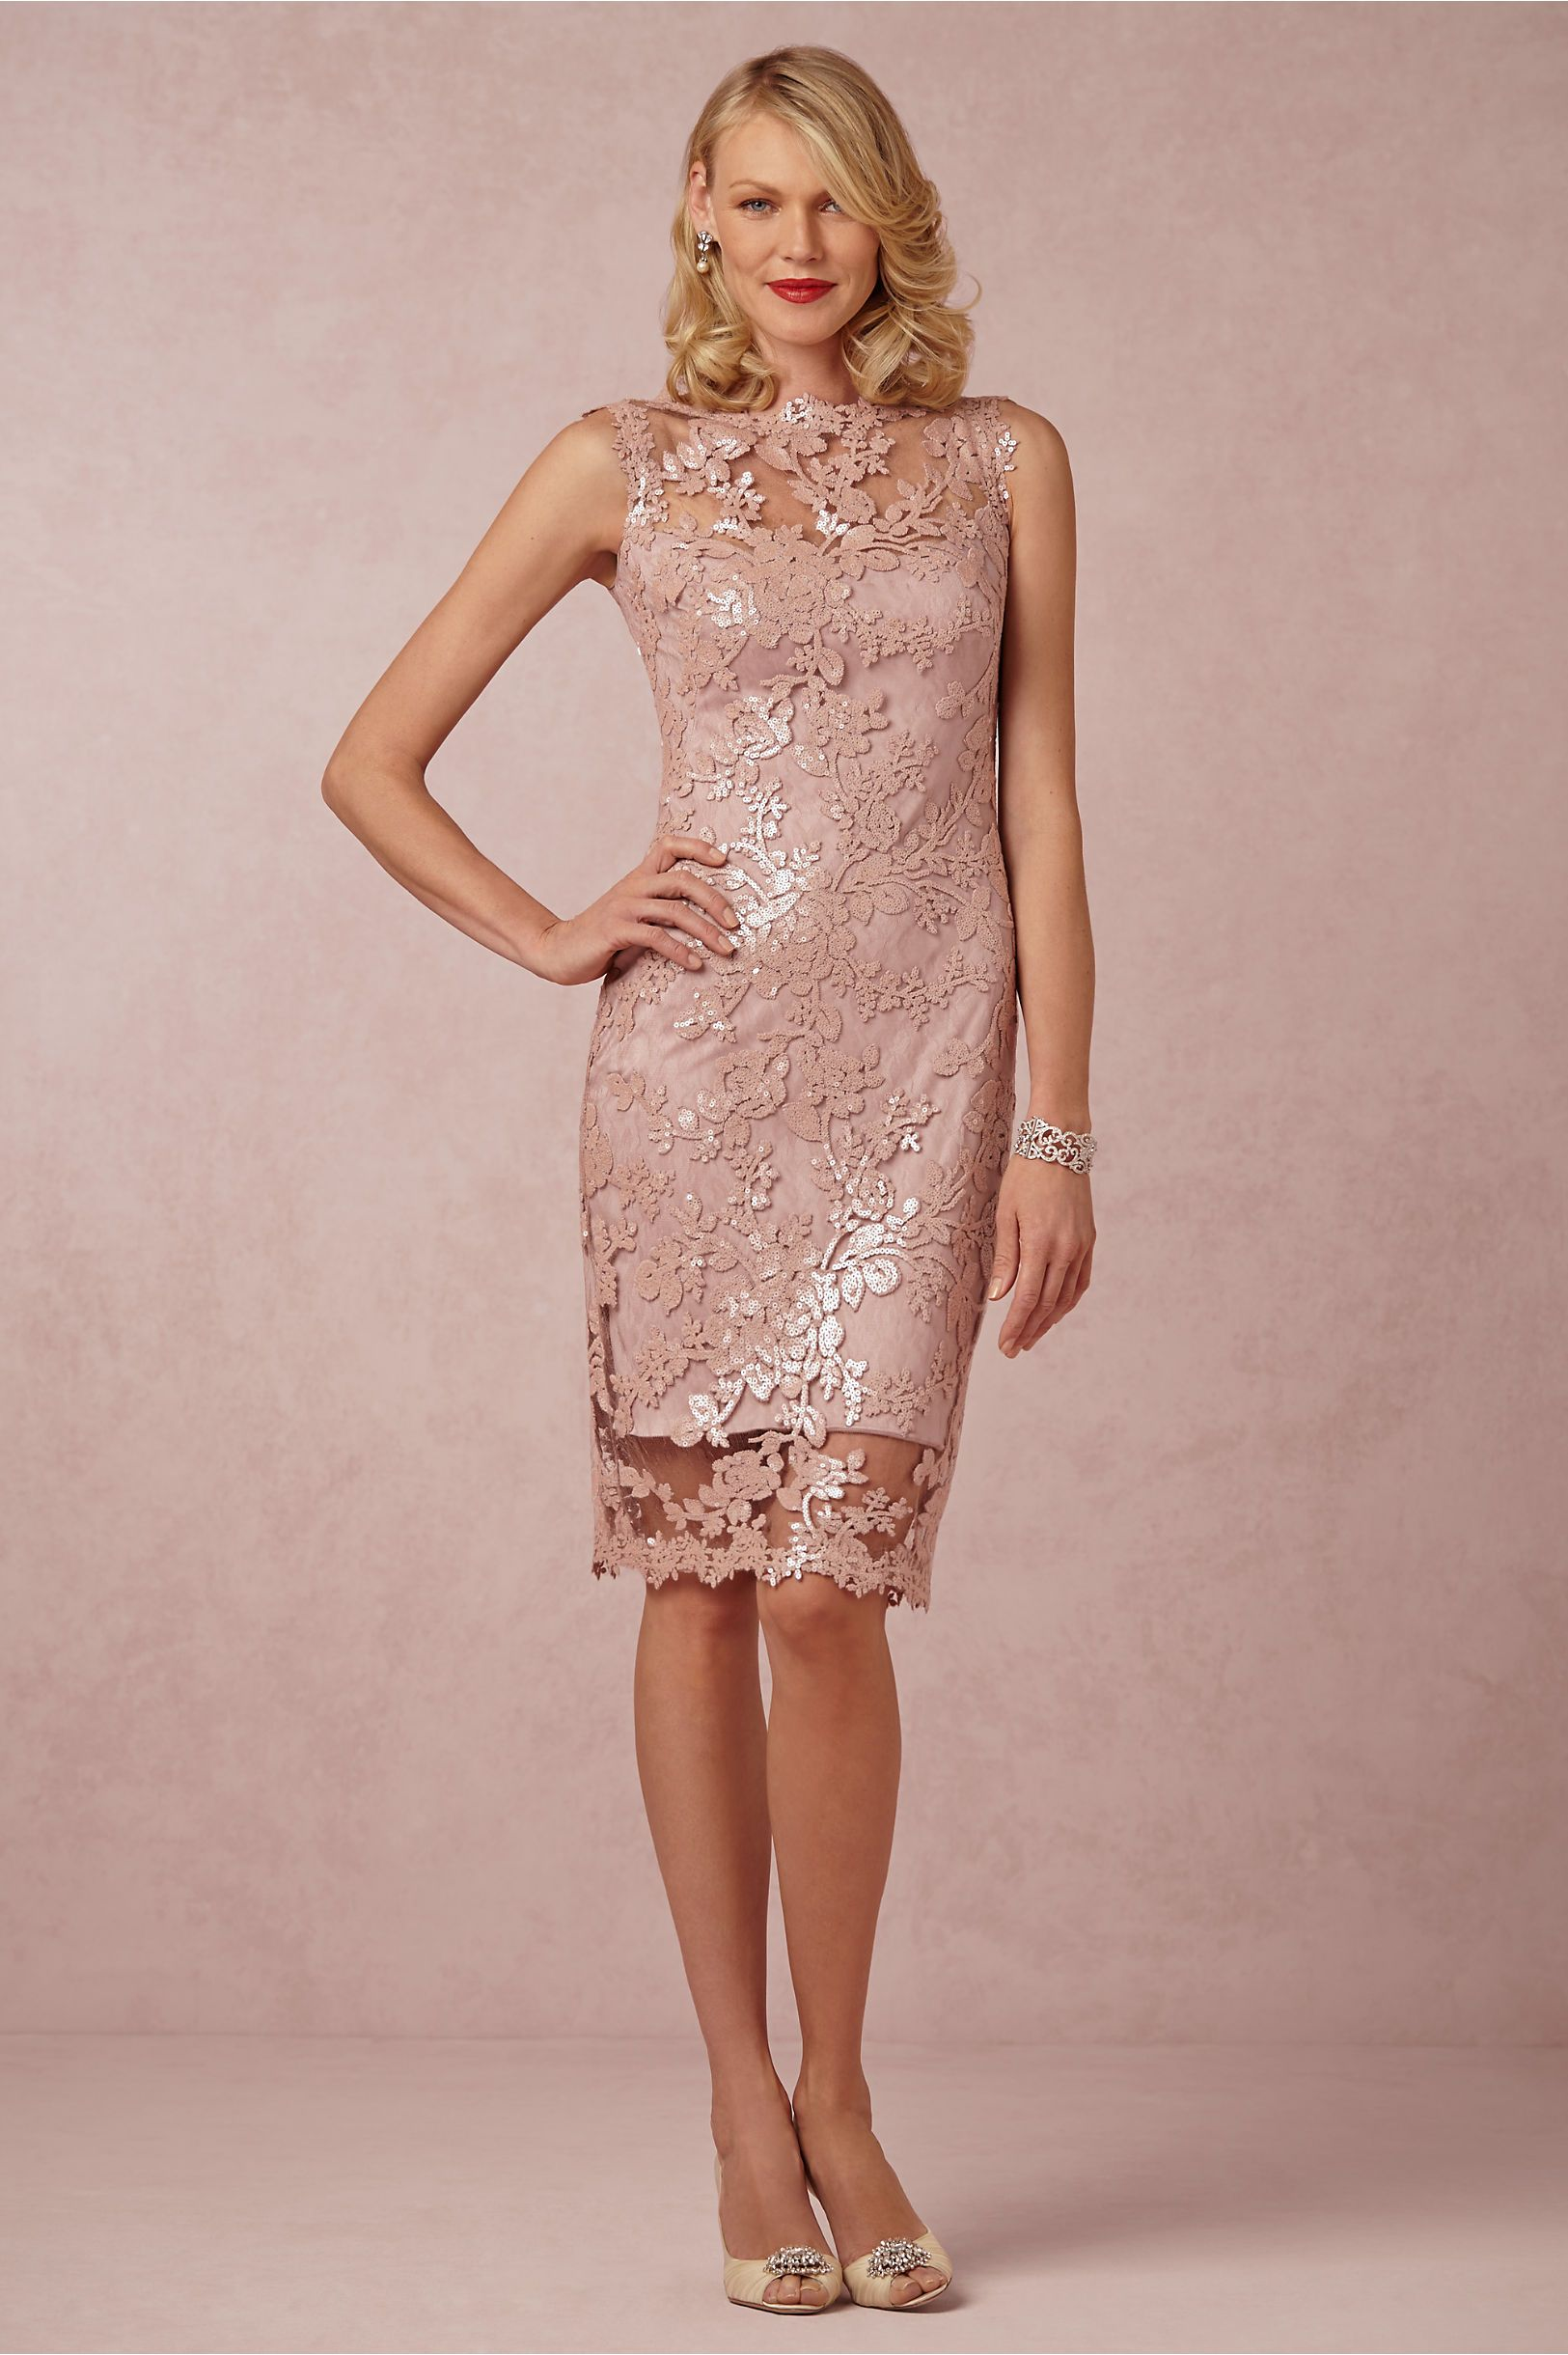 Vestido Rosa con detalles | vestidos sin mangas | Pinterest ...